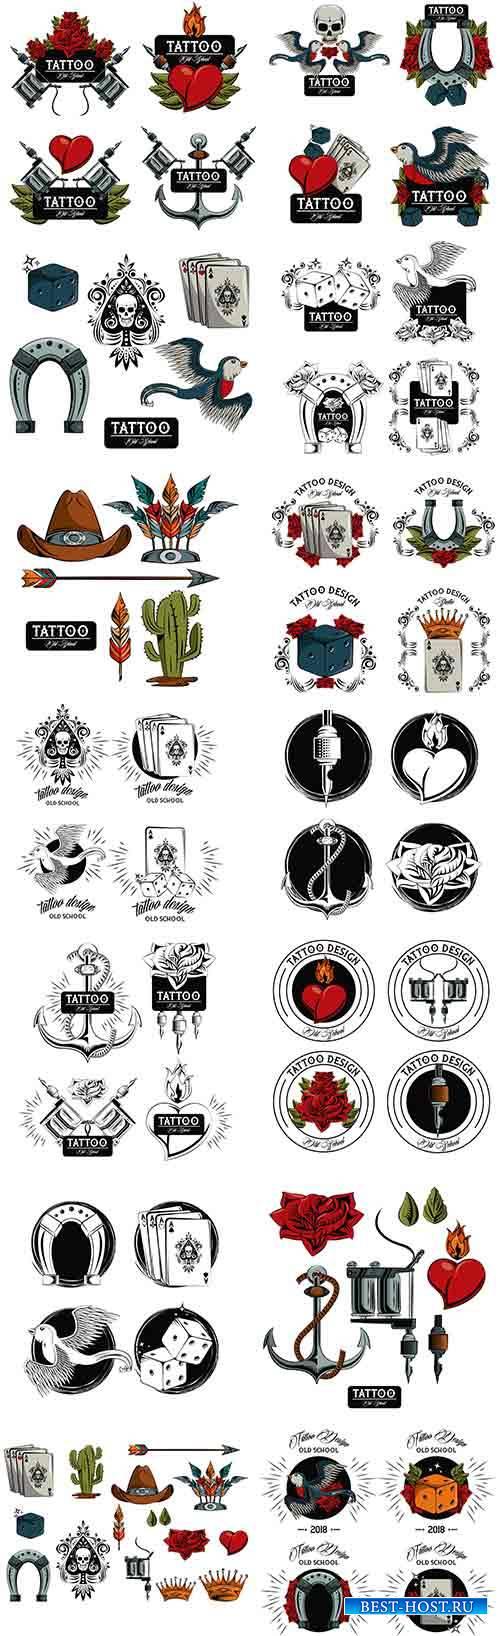 Набор шаблонов для тату в векторе / Set of patterns for tattoo in vector